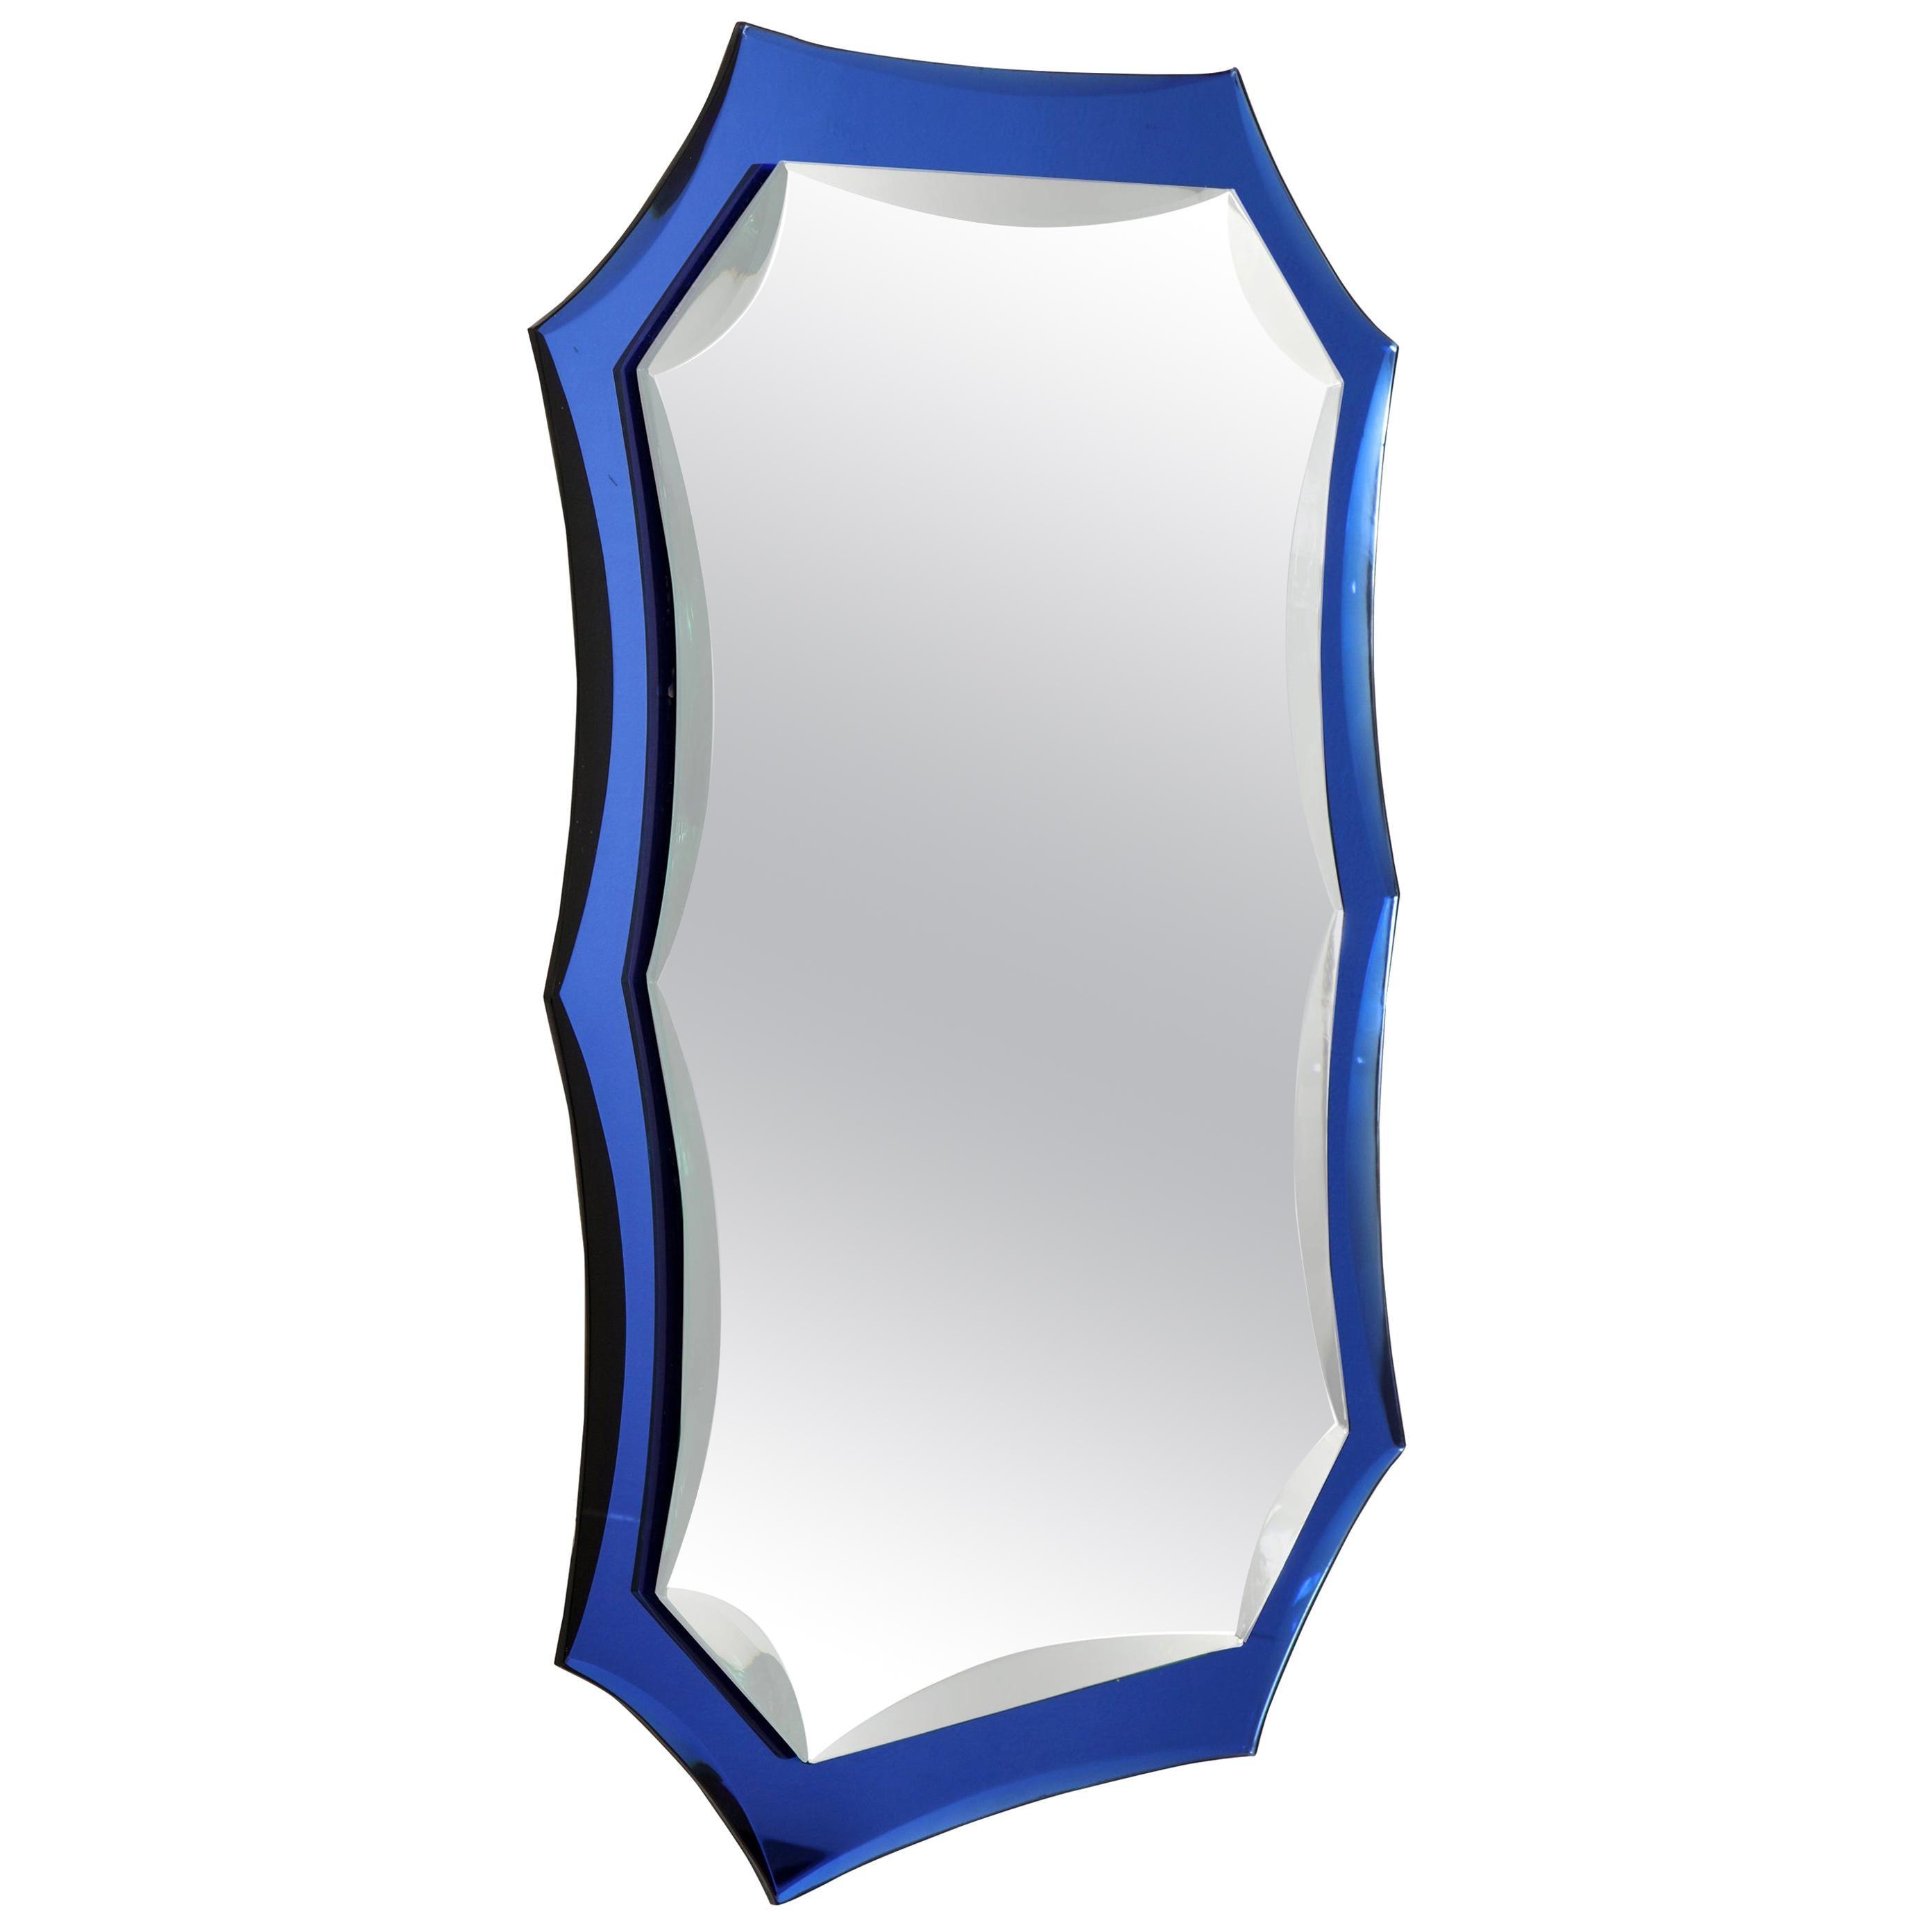 Vintage Mirror with Cobalt Blue Borders